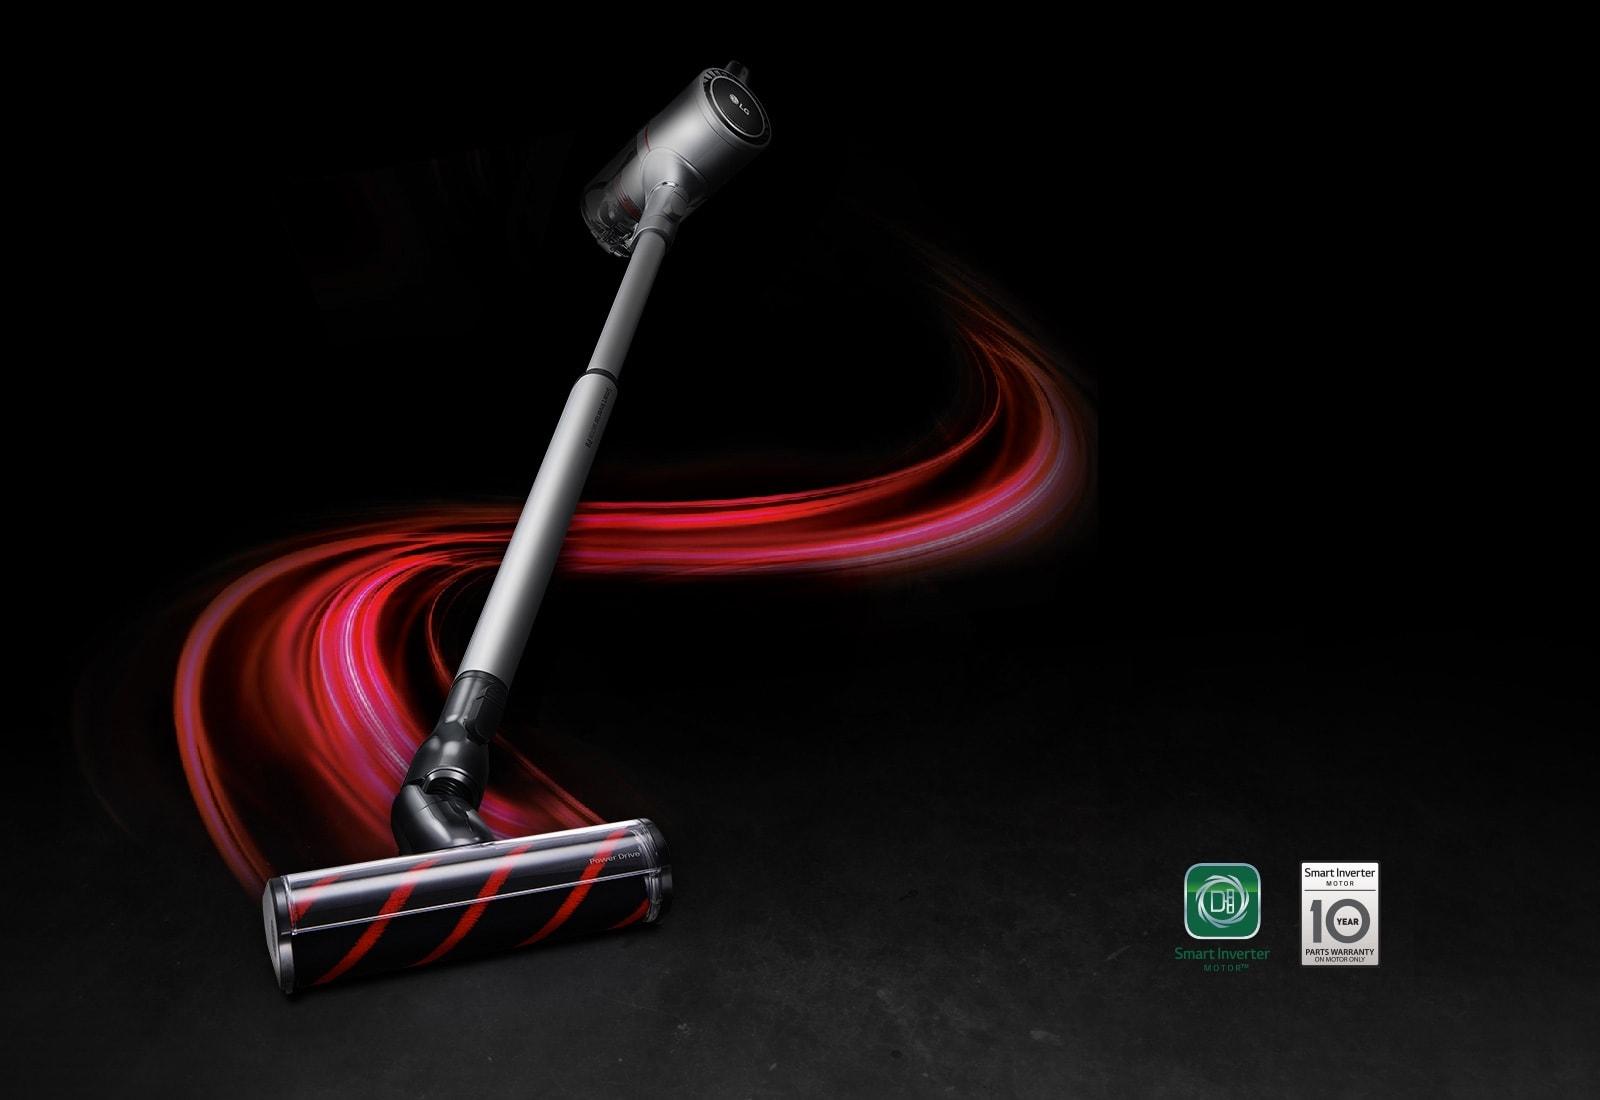 LG CordZero A9MASTER2X | Cordless Handheld Stick Vacuum ... | 1600 x 1100 jpeg 268kB